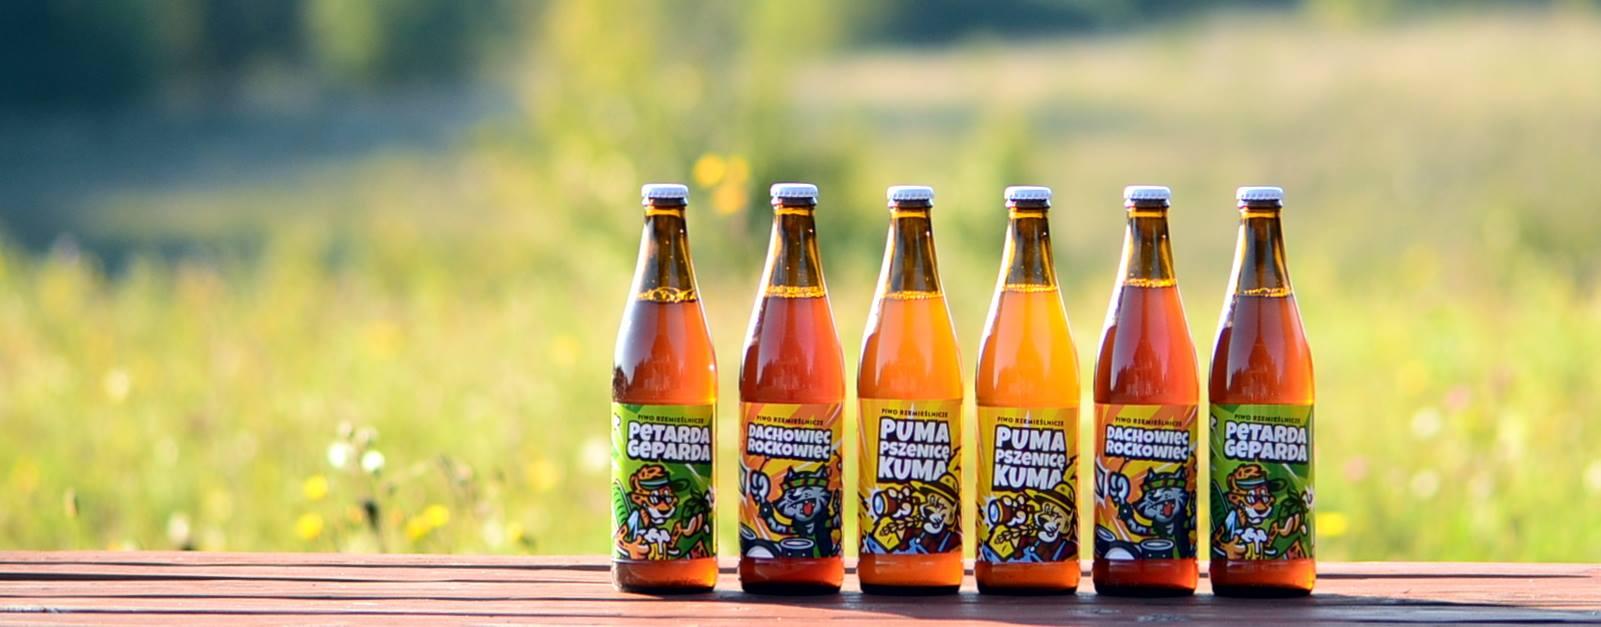 Browar Dziki Kocur - portfolio piw